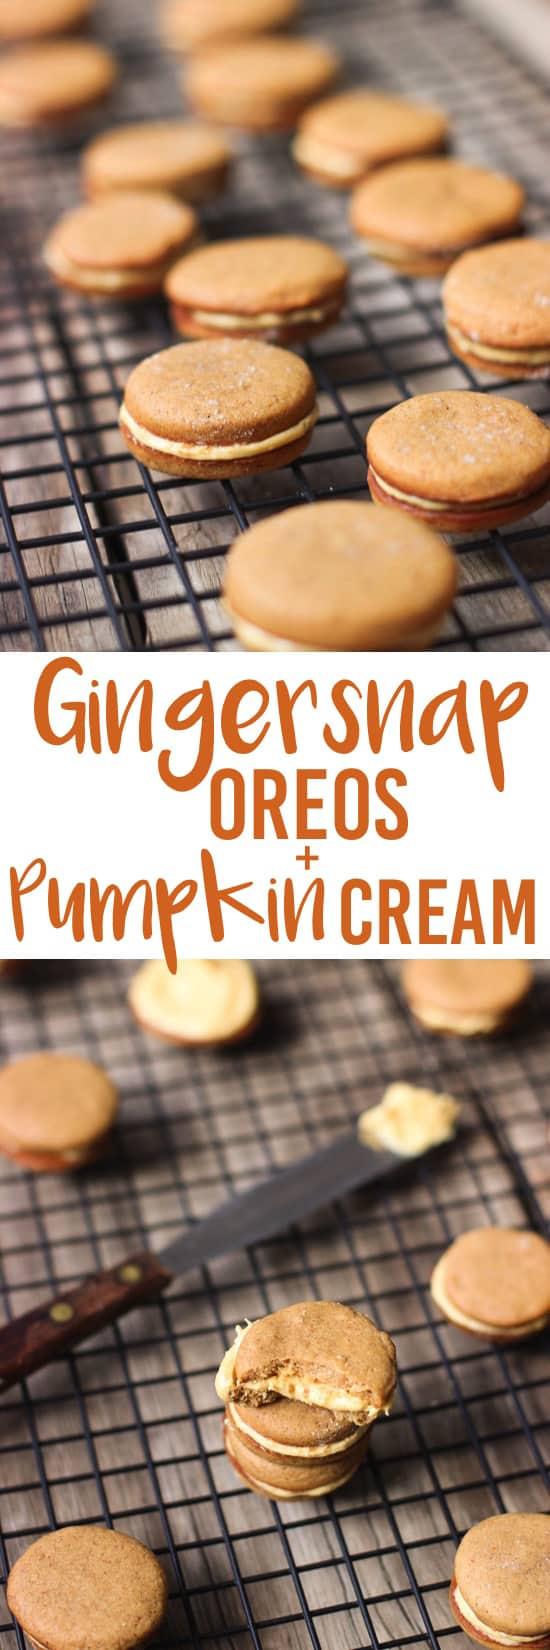 Gingersnap Oreos with Pumpkin Cream | mysequinedlife.com